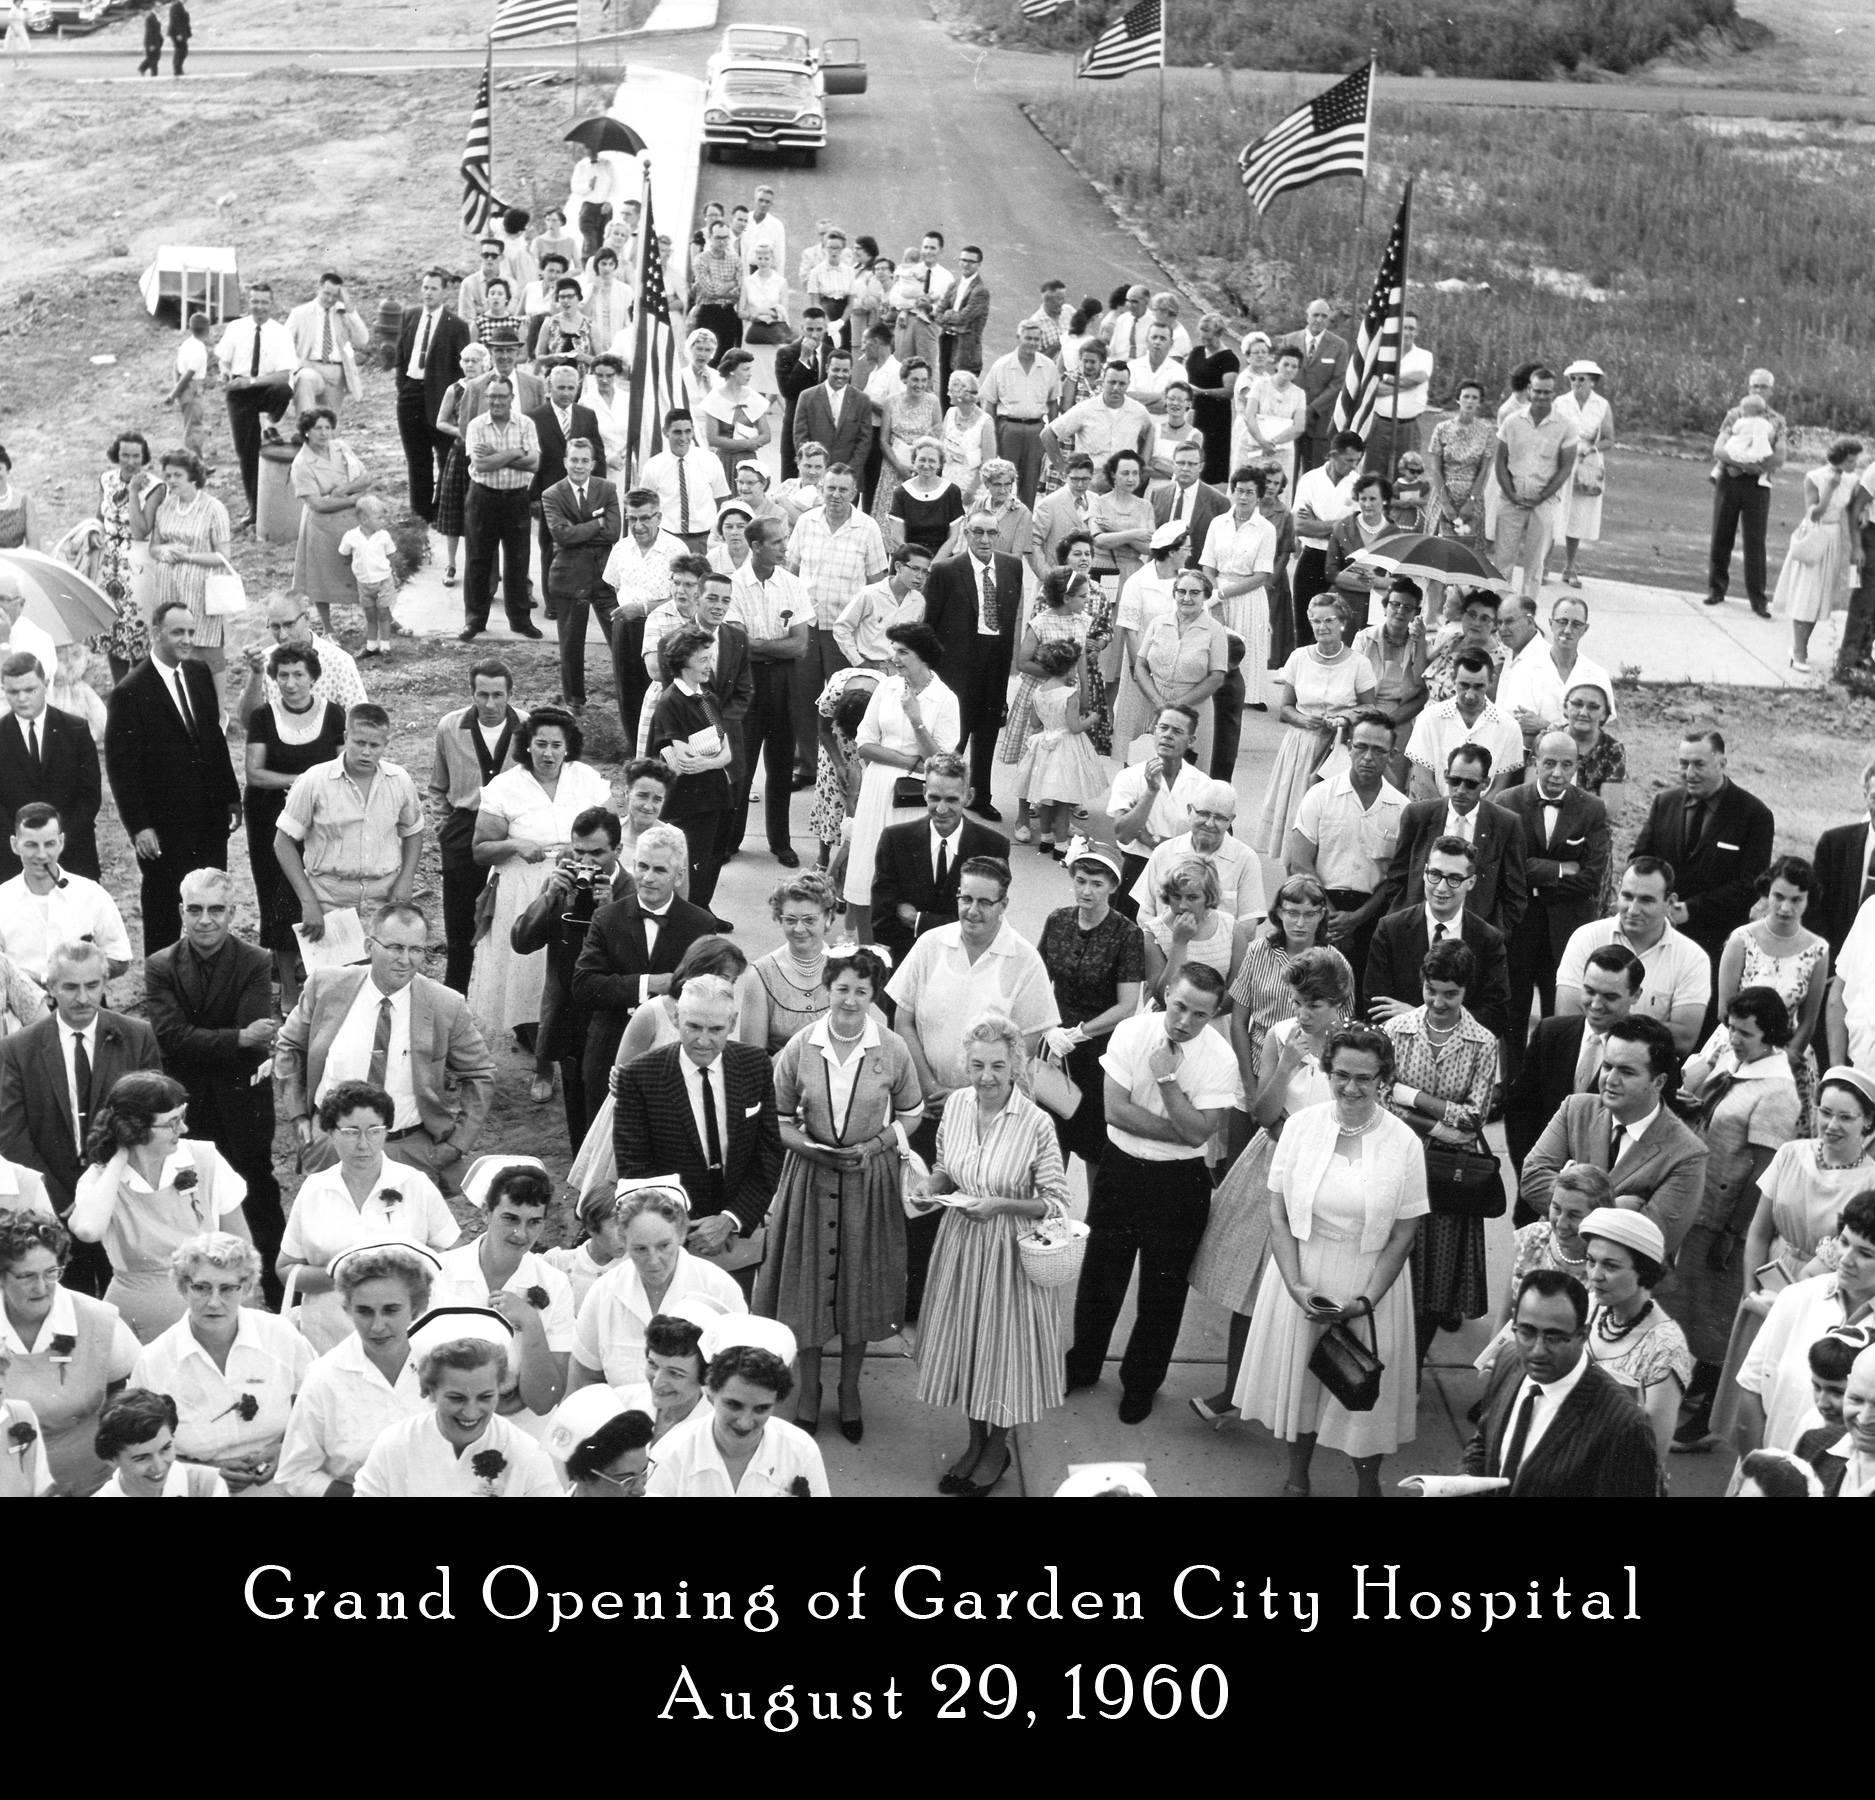 Photo Courtesy of the Garden City Hospital Facebook Page.